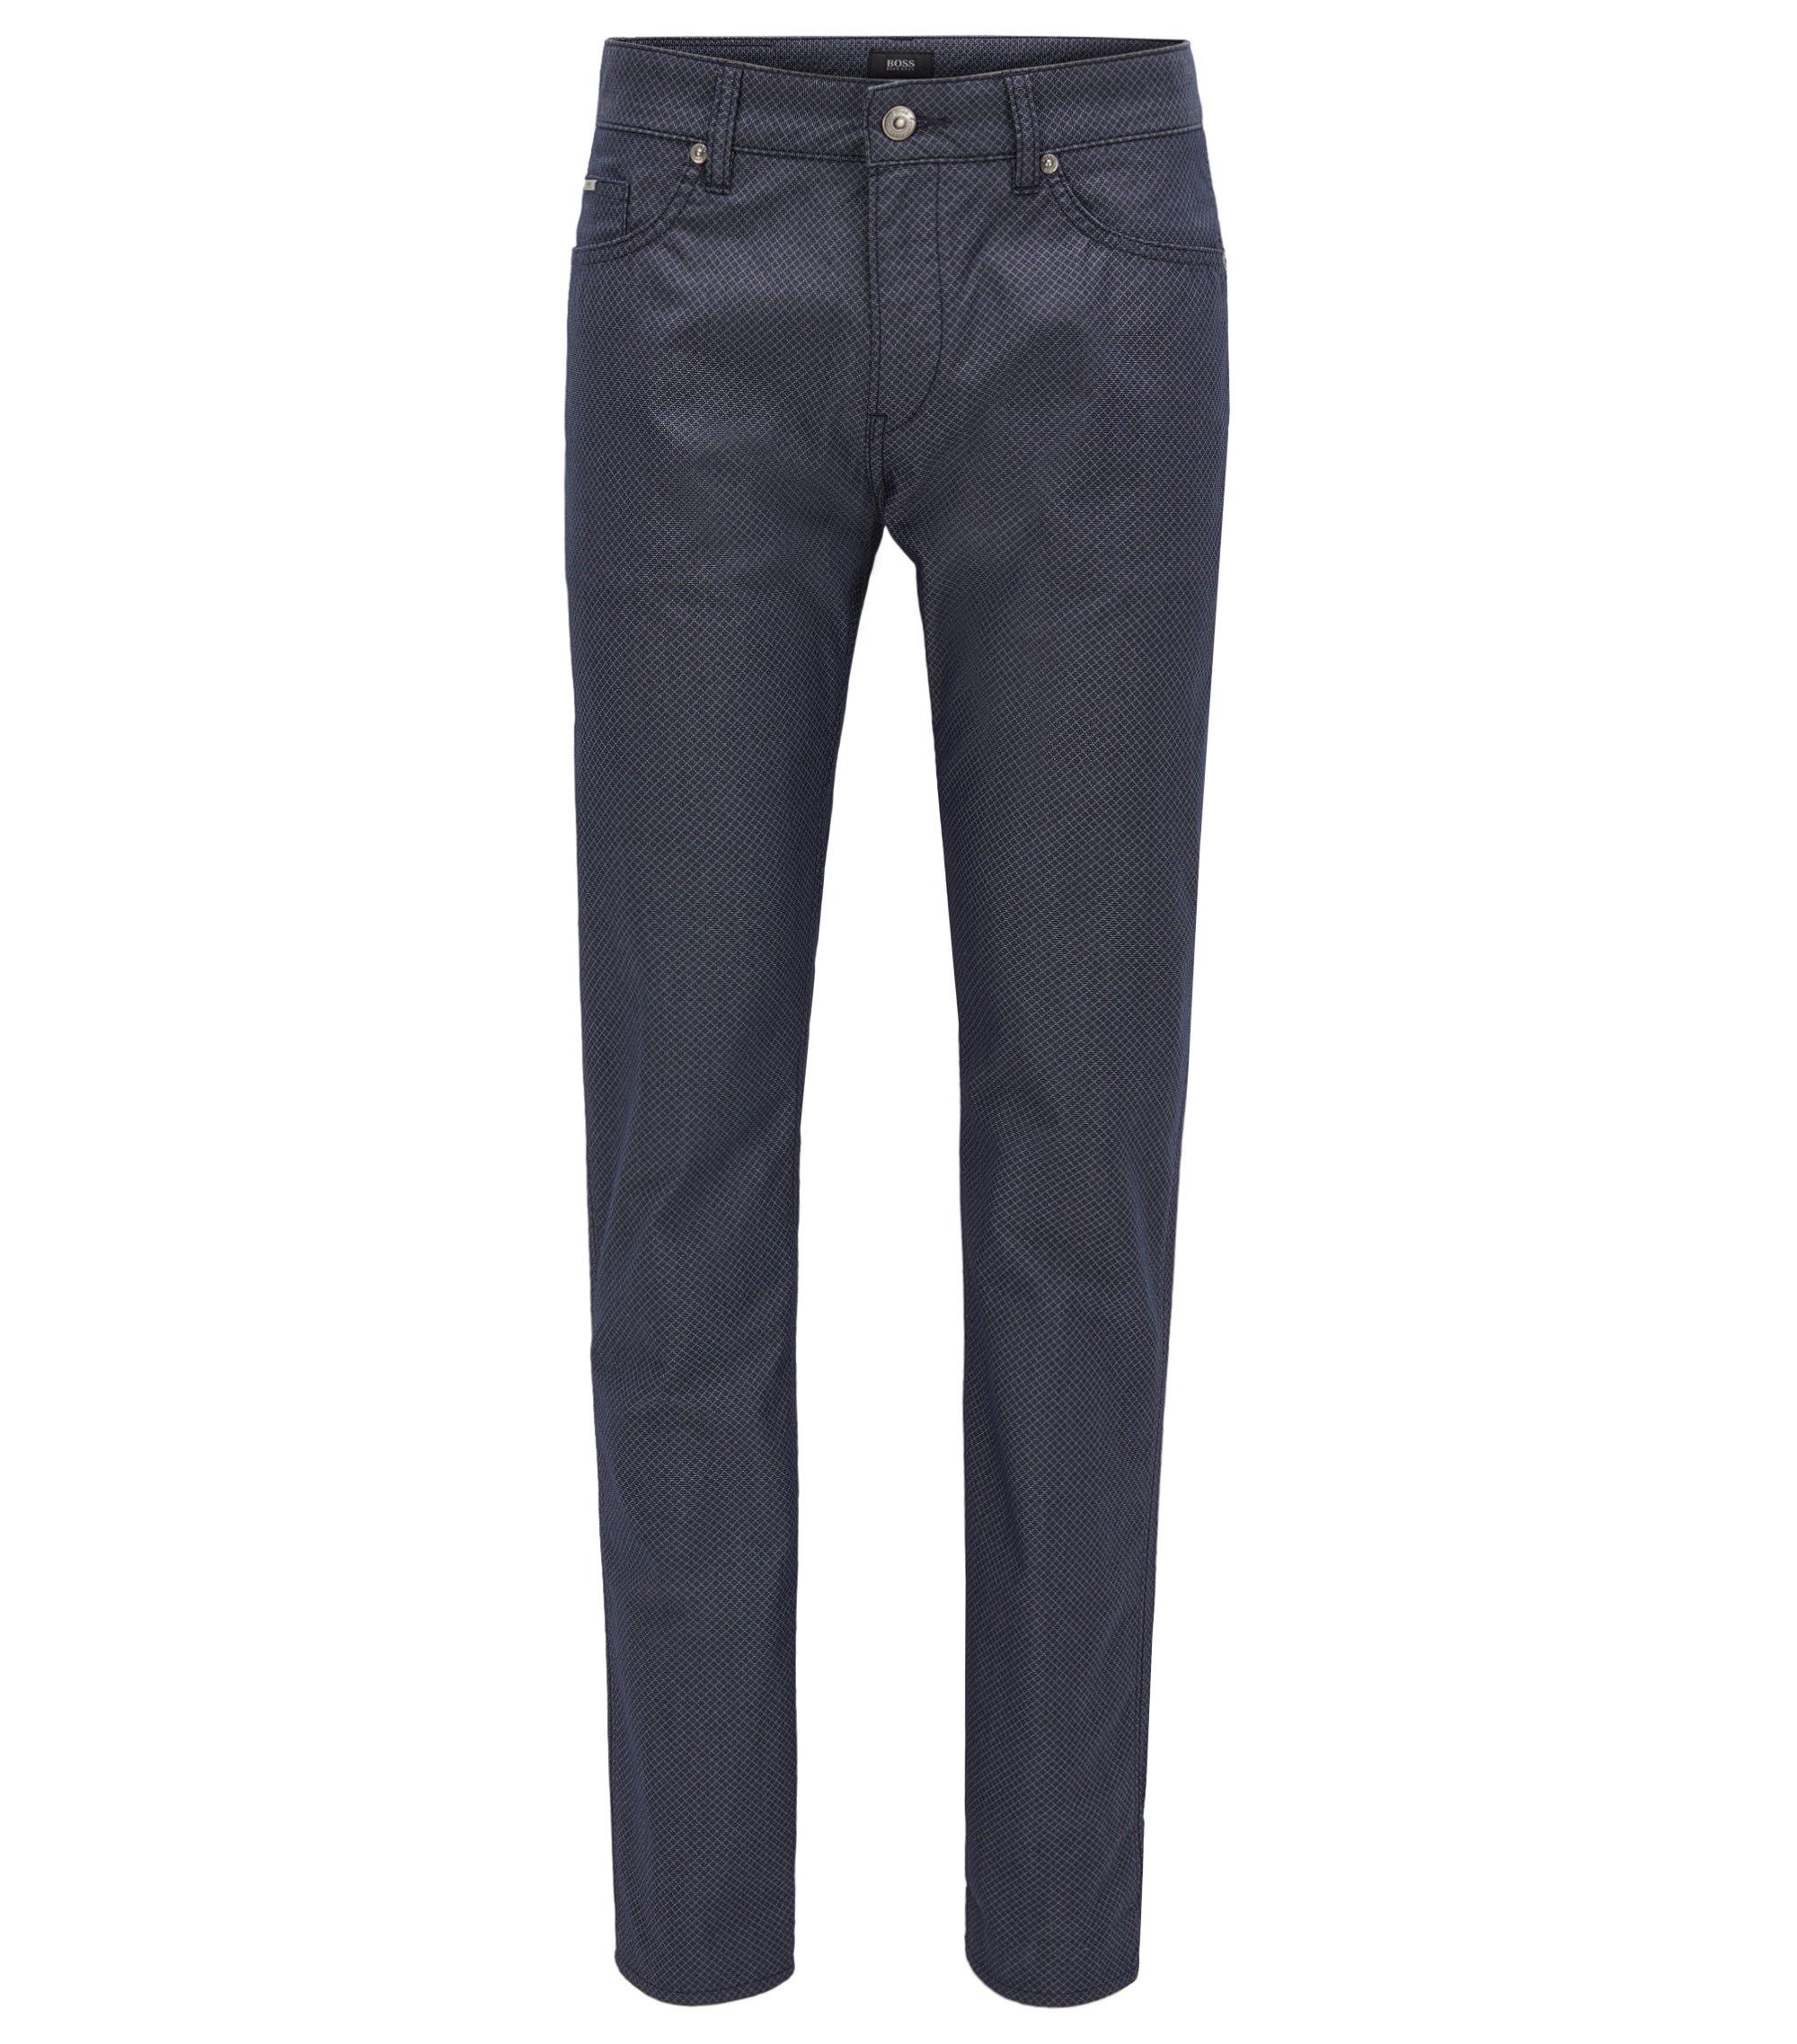 Diamond Print Stretch Cotton Jeans, Slim Fit | Delaware, Dark Blue